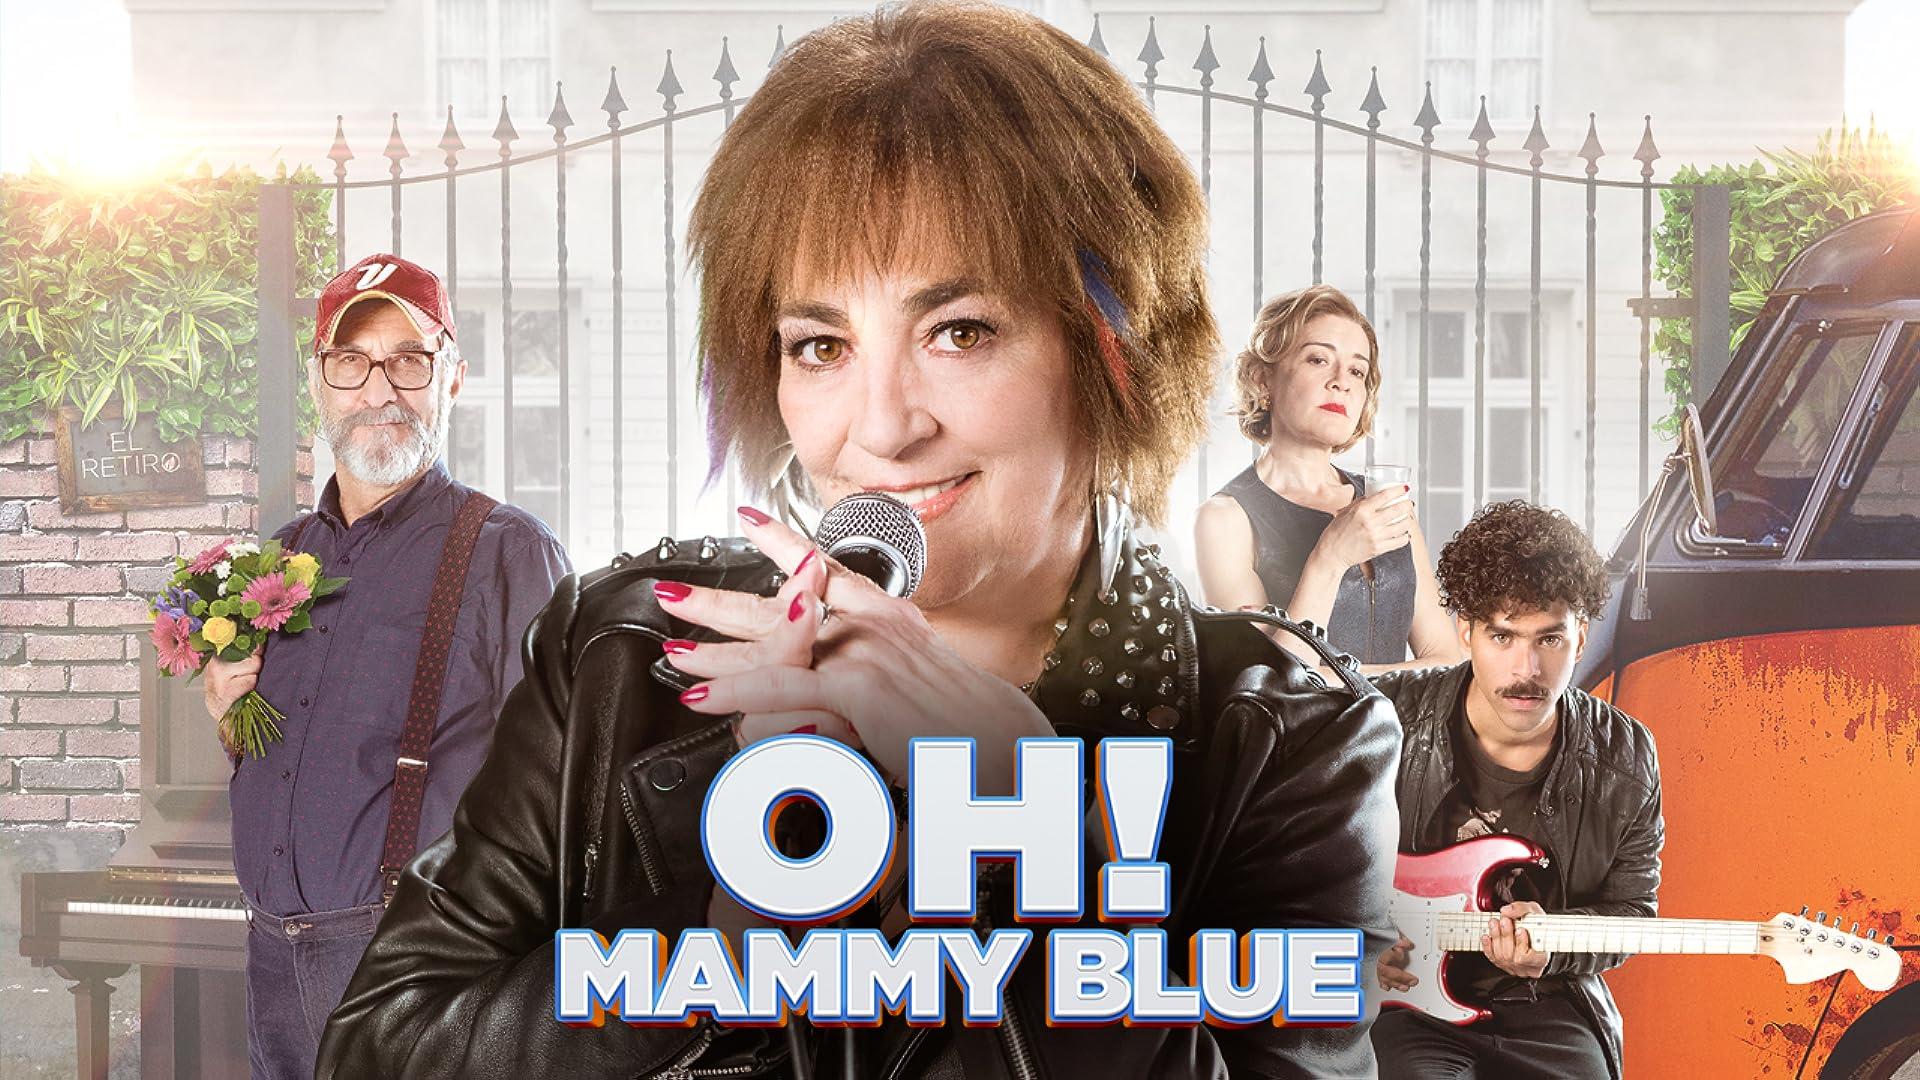 Oh! Mammy Blue